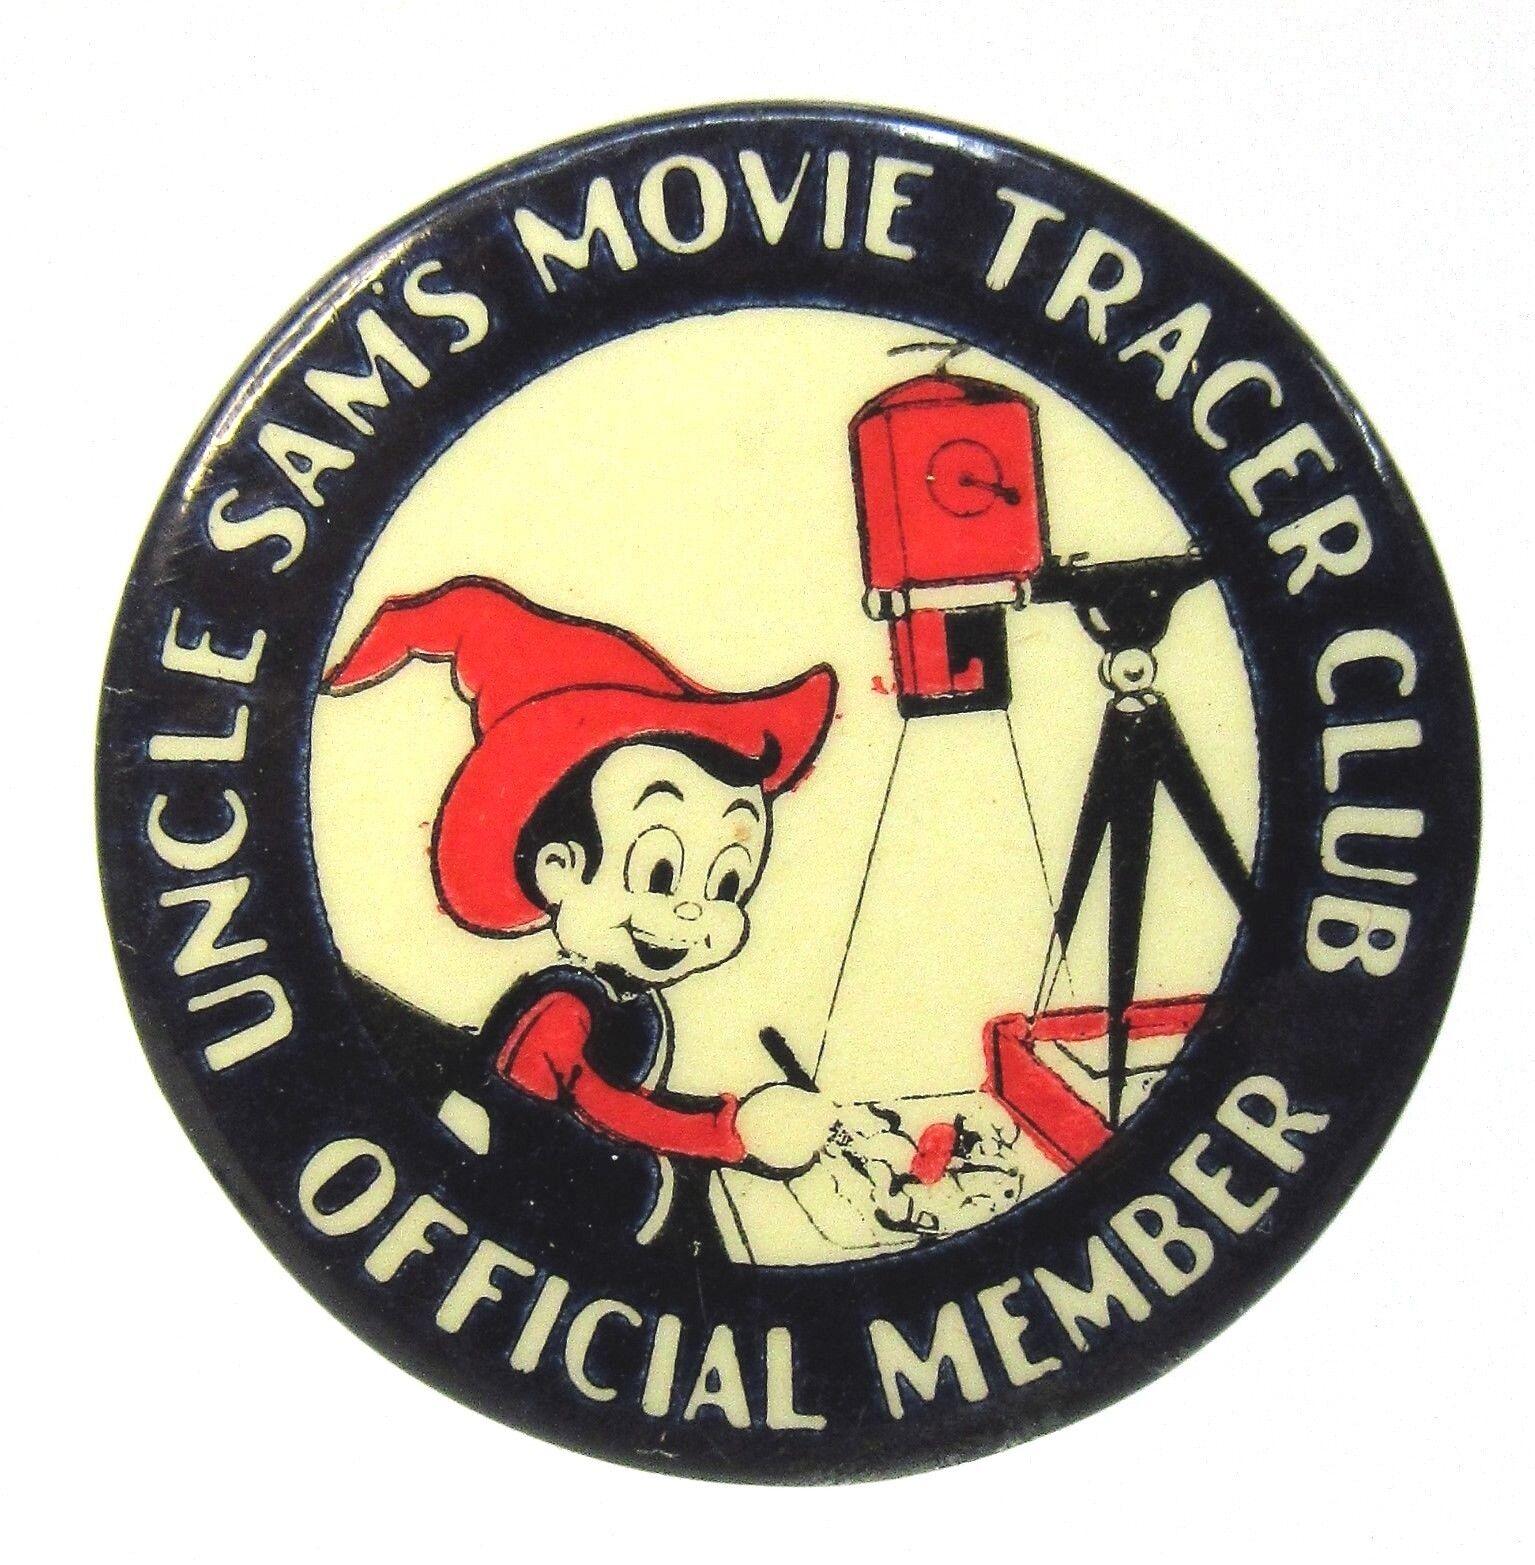 Década de 1930 miembro tío SAMS película Tracer Club Juguete Publicidad botón de Pinback